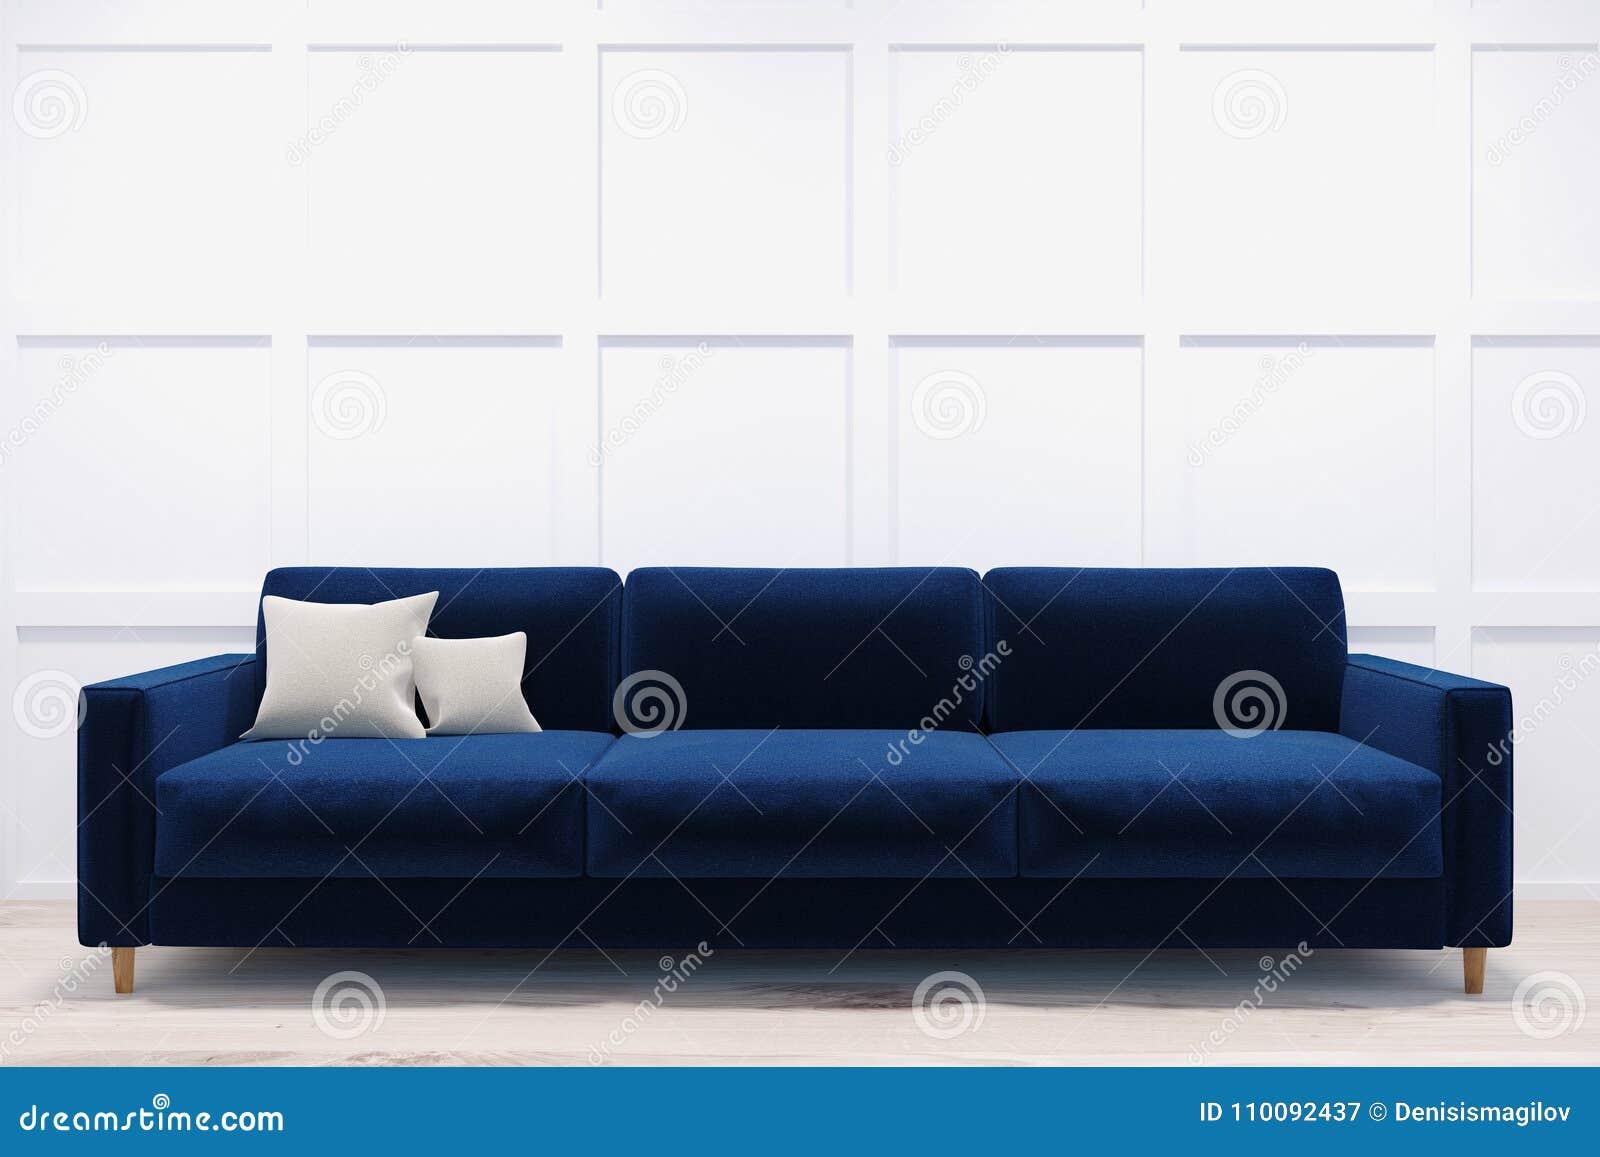 Picture of: Dark Blue Sofa In A White Room Stock Illustration Illustration Of Corridor Elegance 110092437